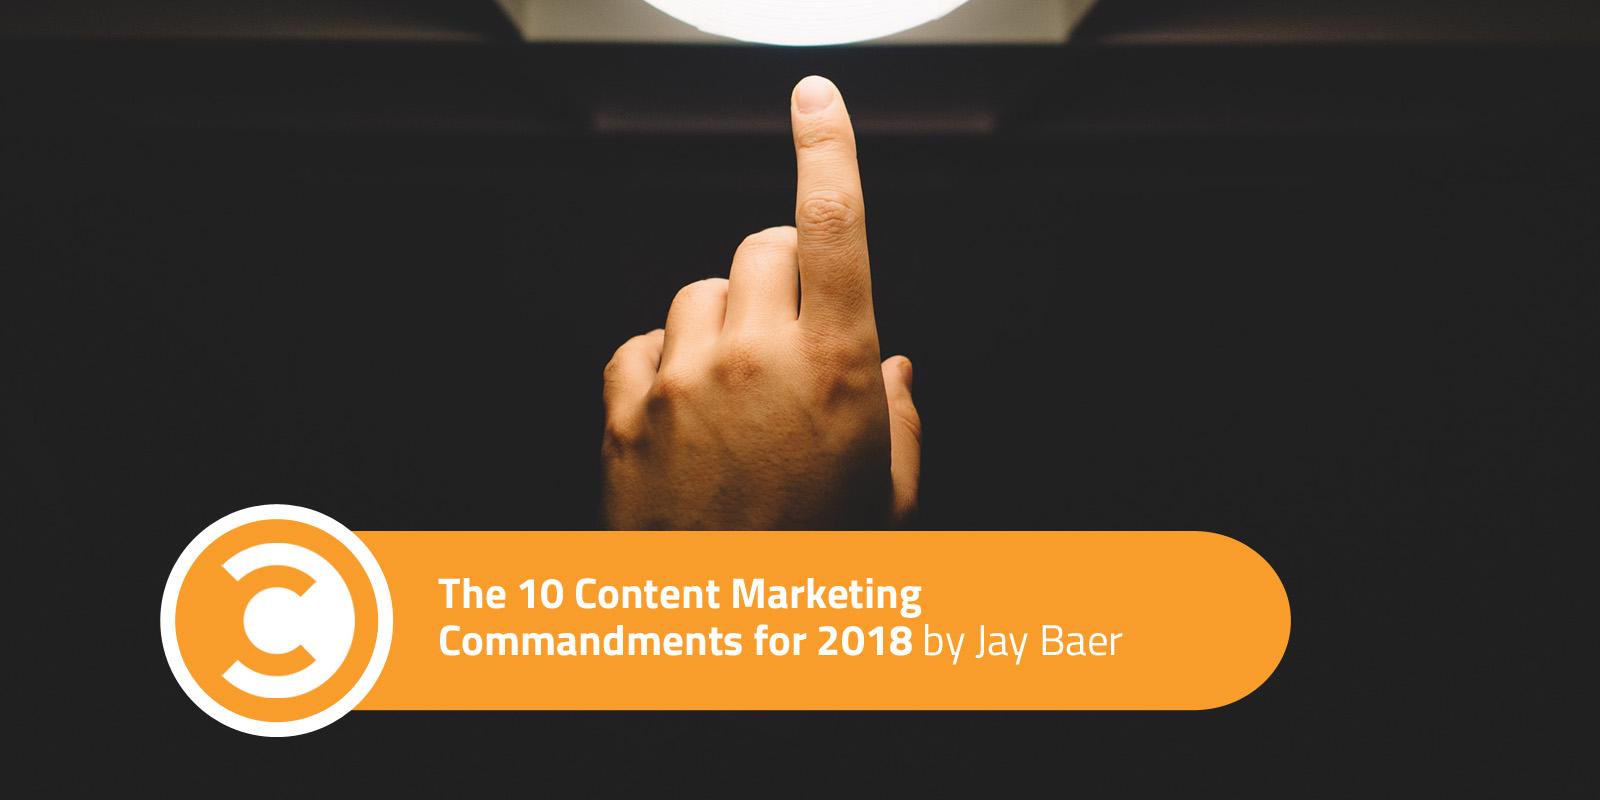 The 10 Content Marketing Commandments for 2018